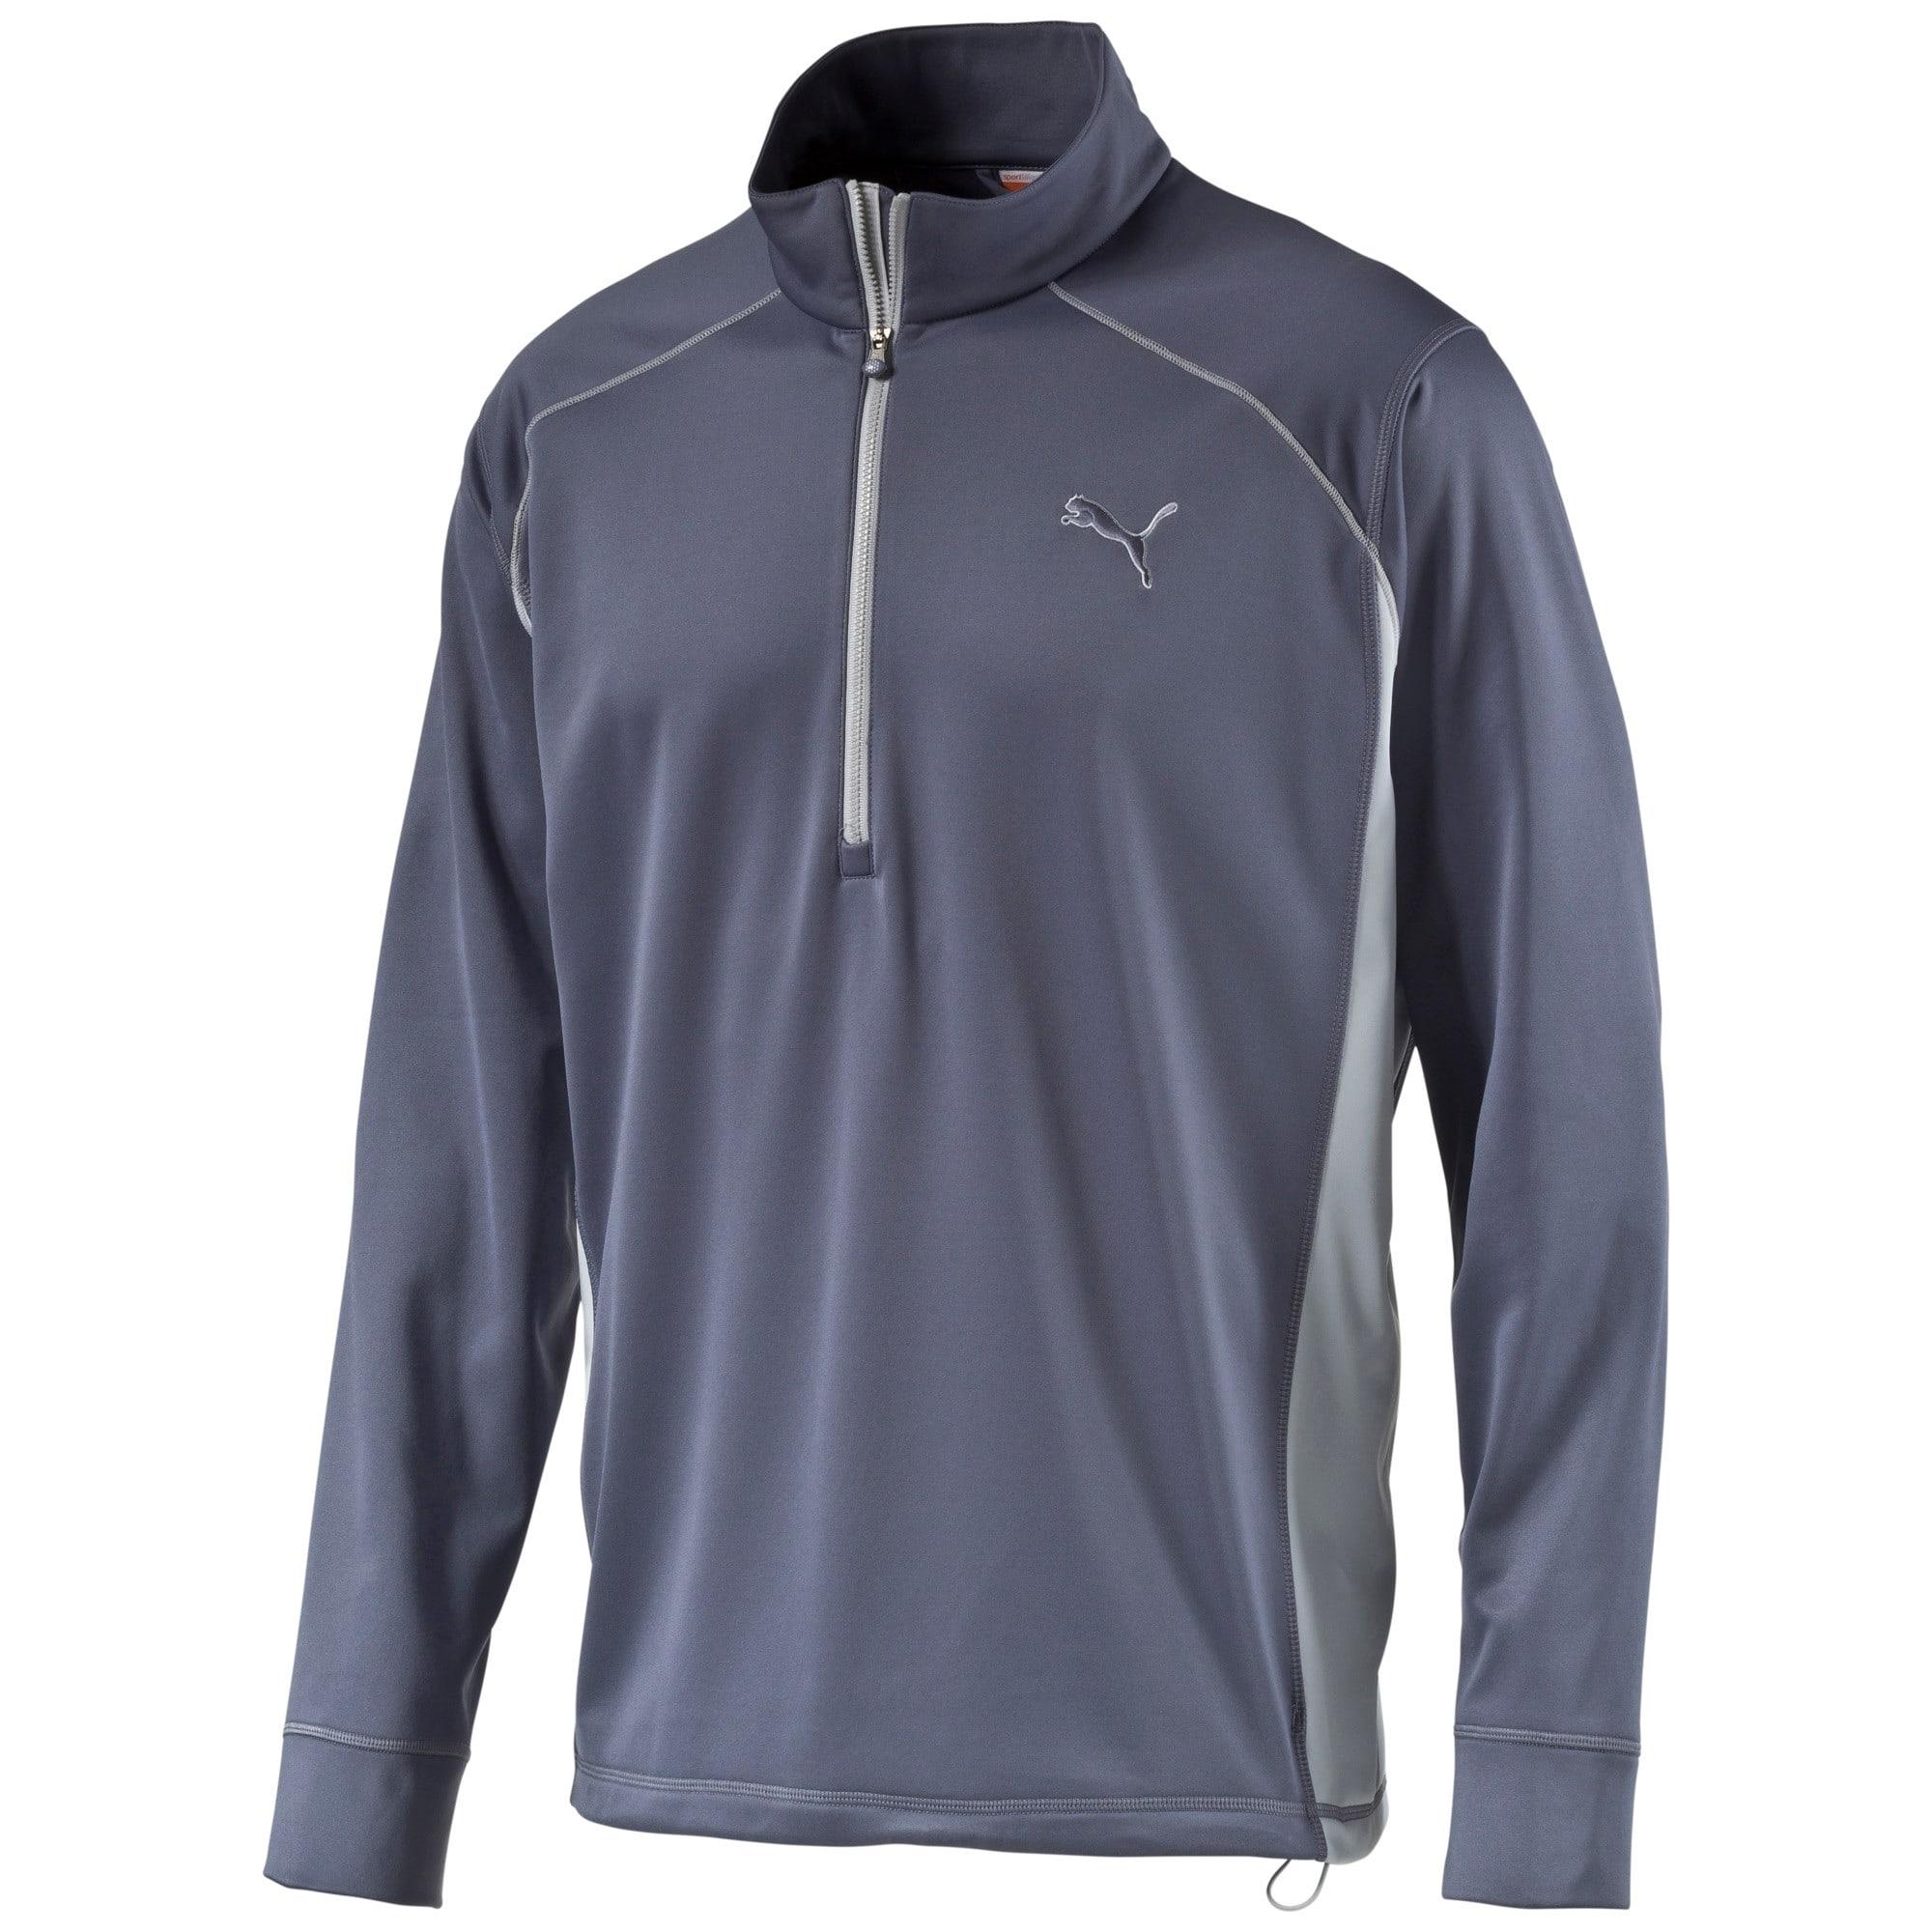 Thumbnail 1 of Golf Essential Sweater, folkstone gray-gray dawn, medium-IND